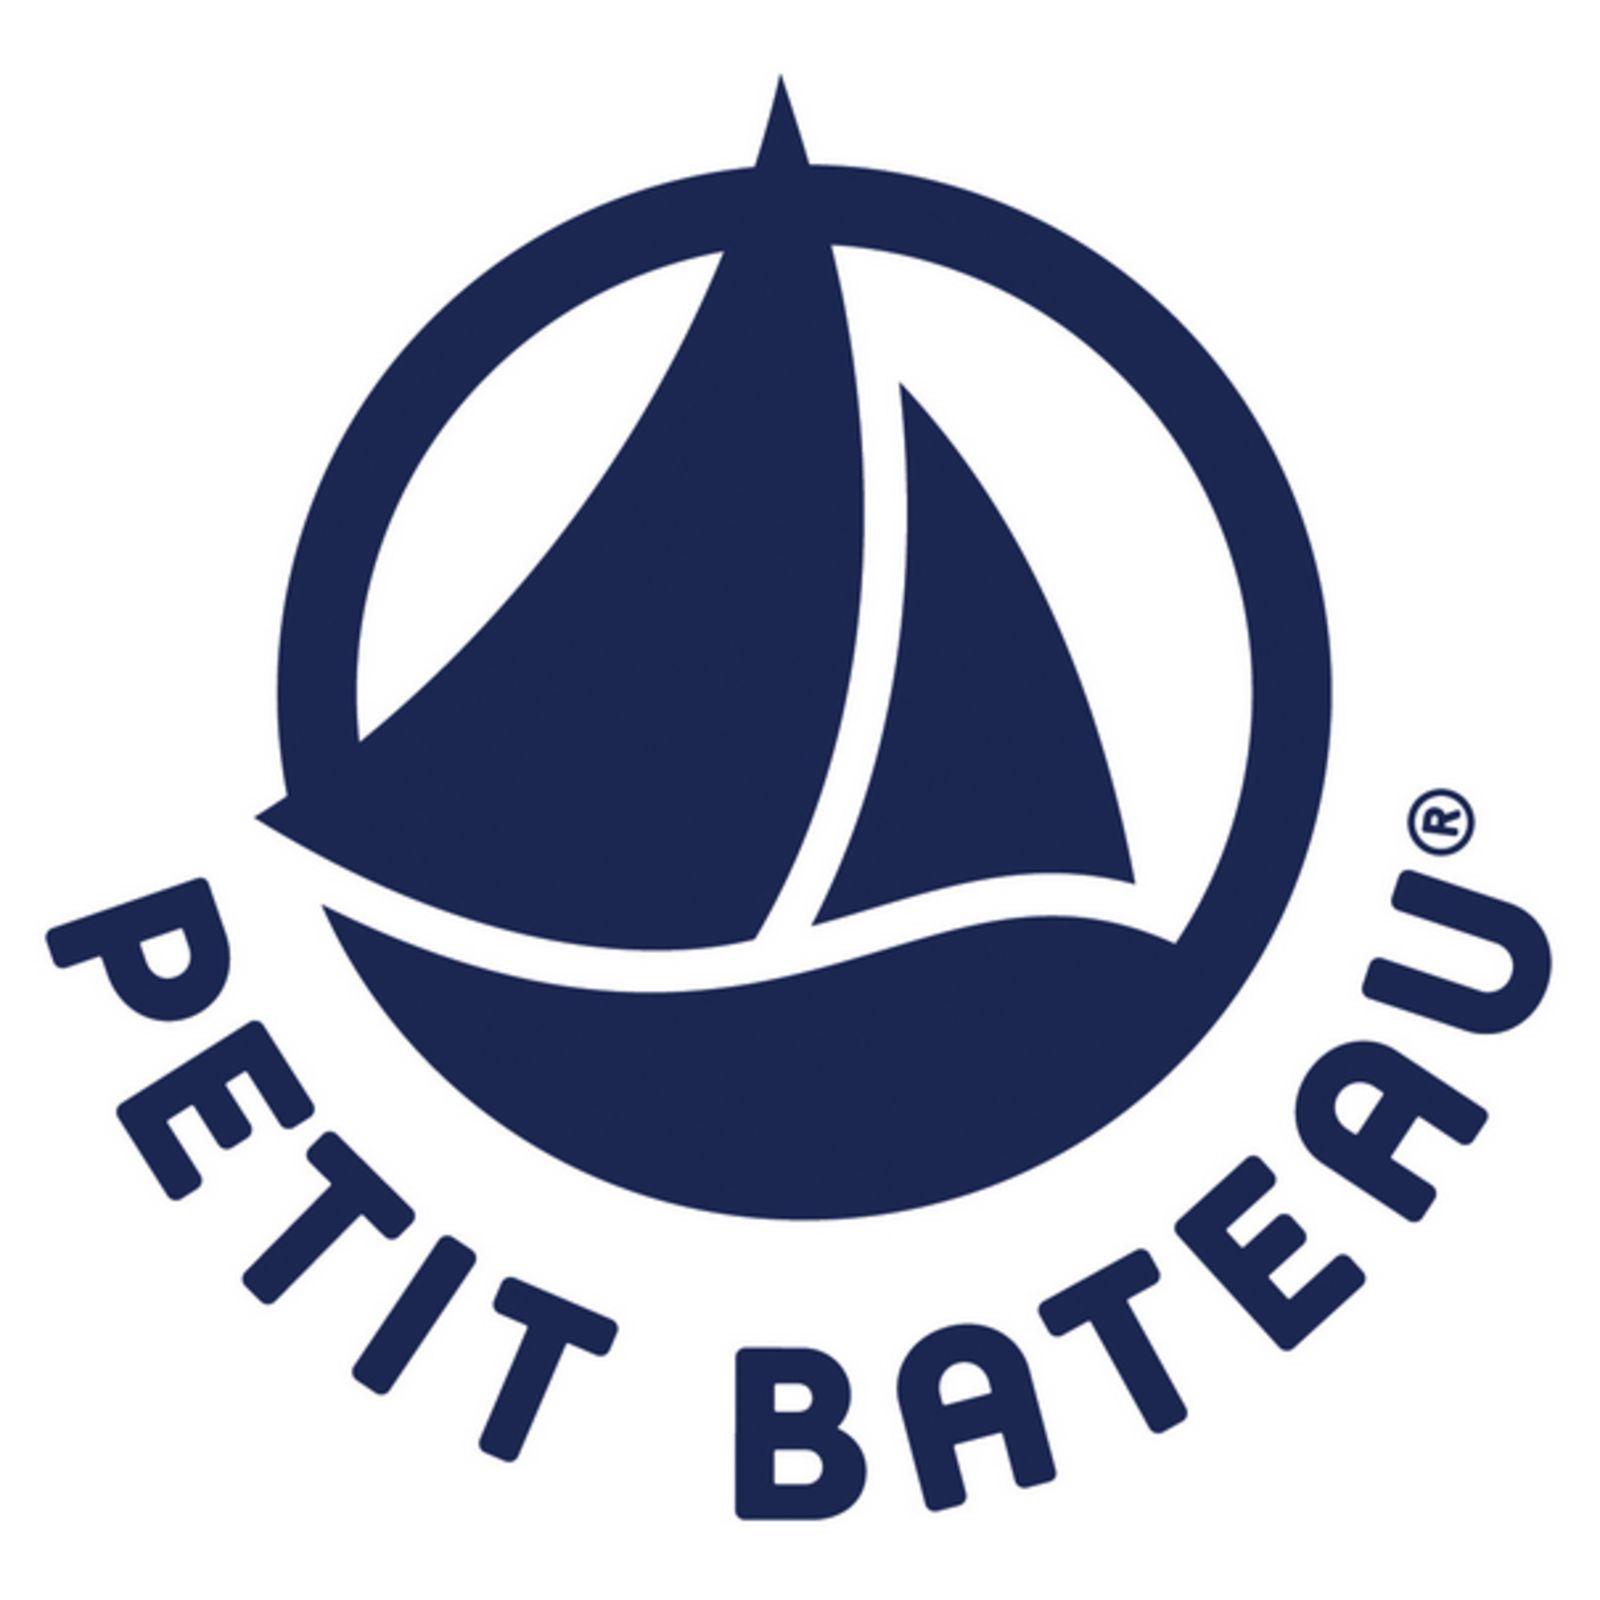 Petit Bateau (Bild 1)